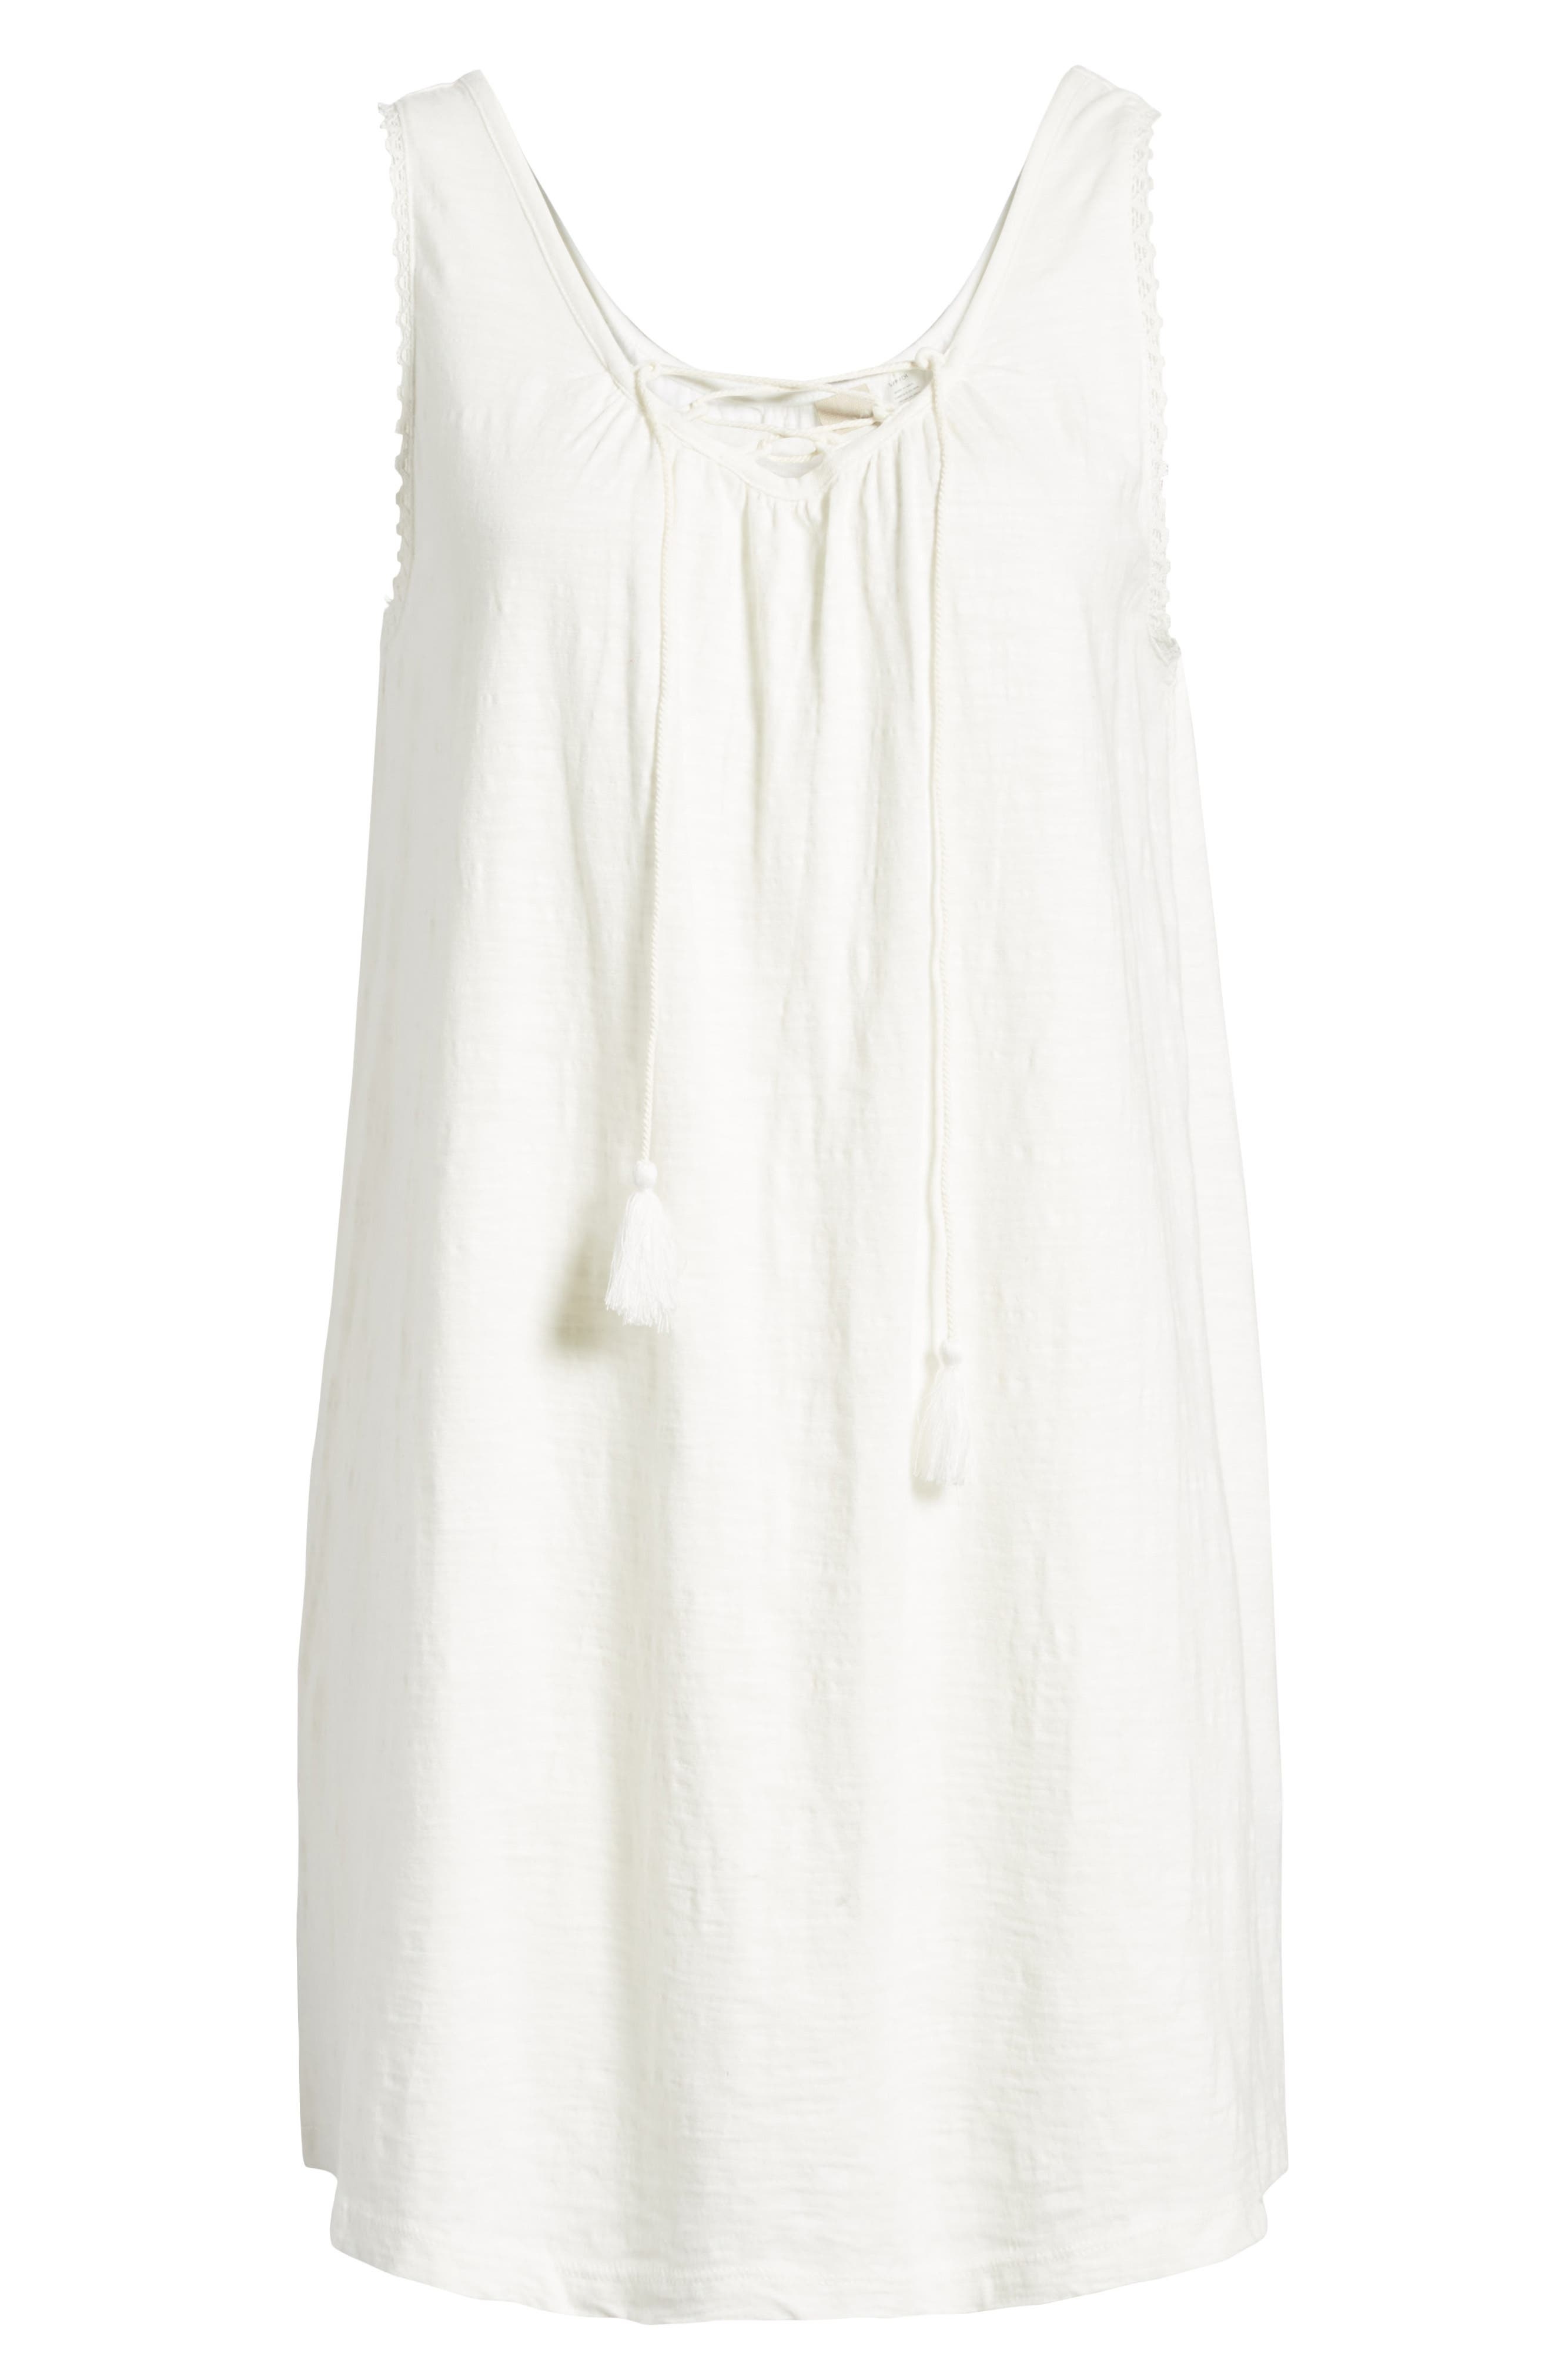 Aguila Lace Up Dress,                             Alternate thumbnail 7, color,                             Marshmallow